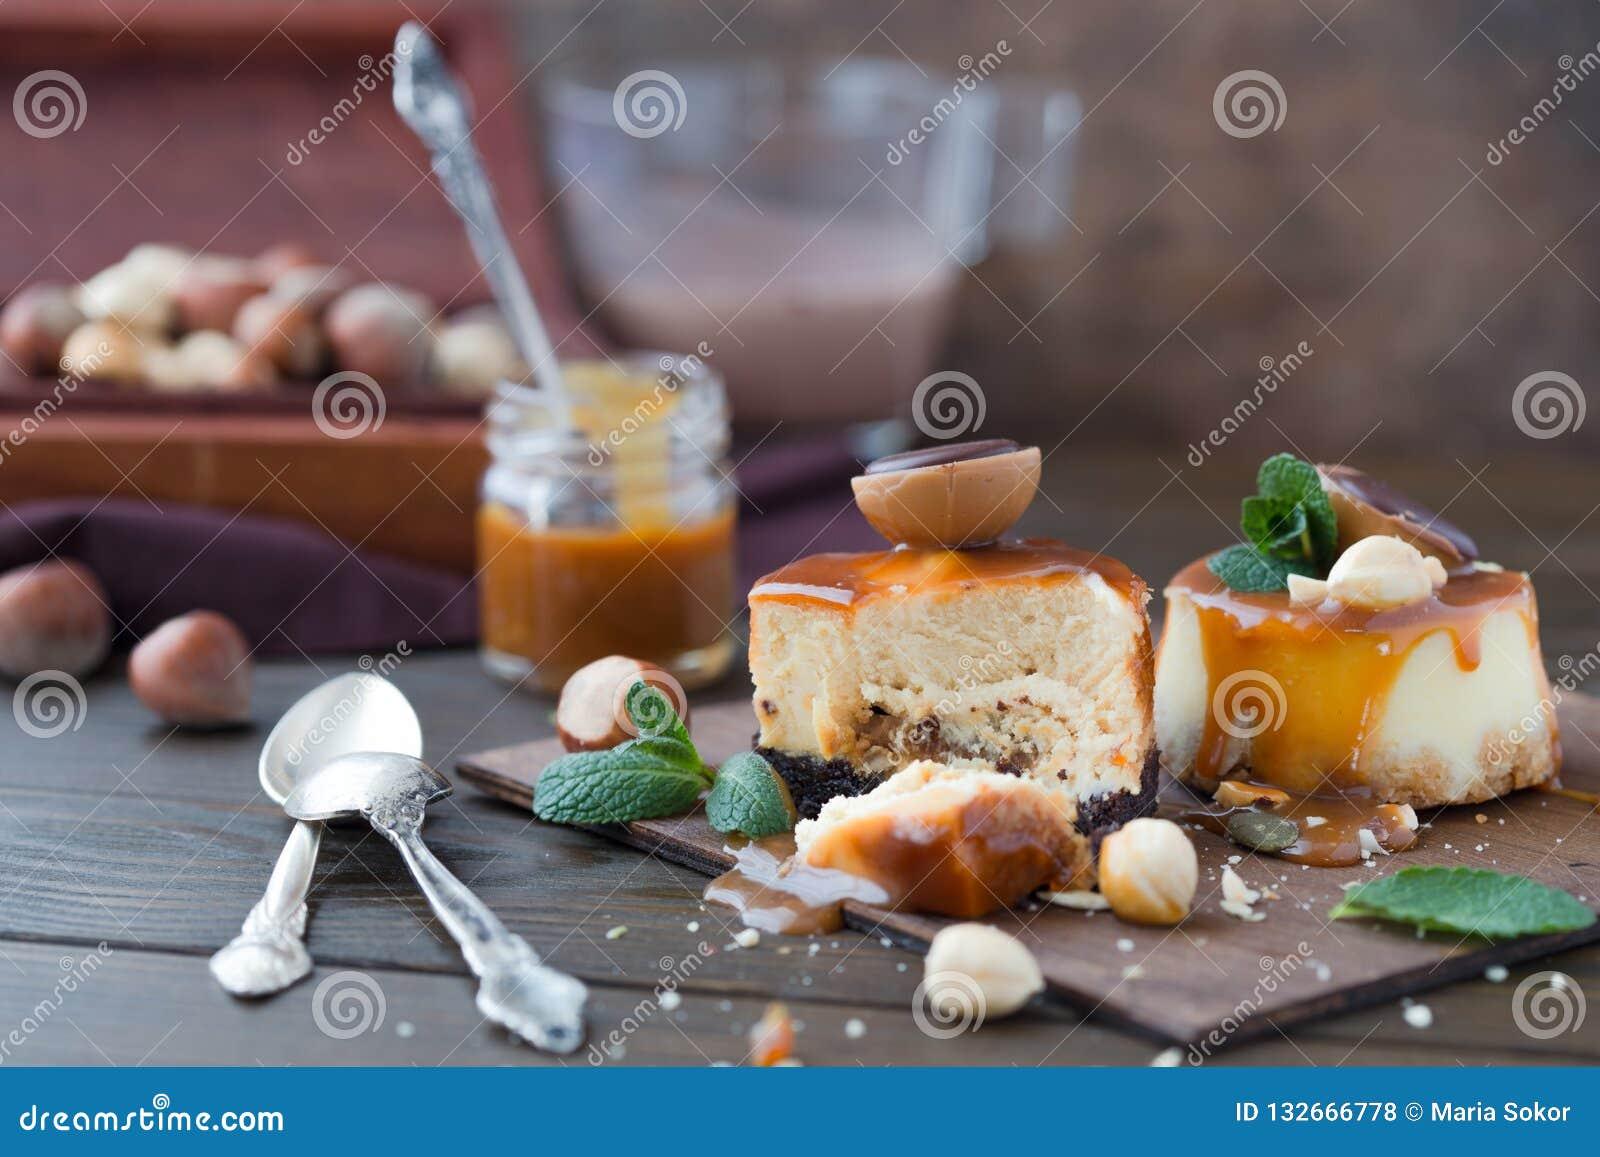 Receita tradicional do bolo do inverno do bolo de queijo do Natal Fatia do bolo de queijo